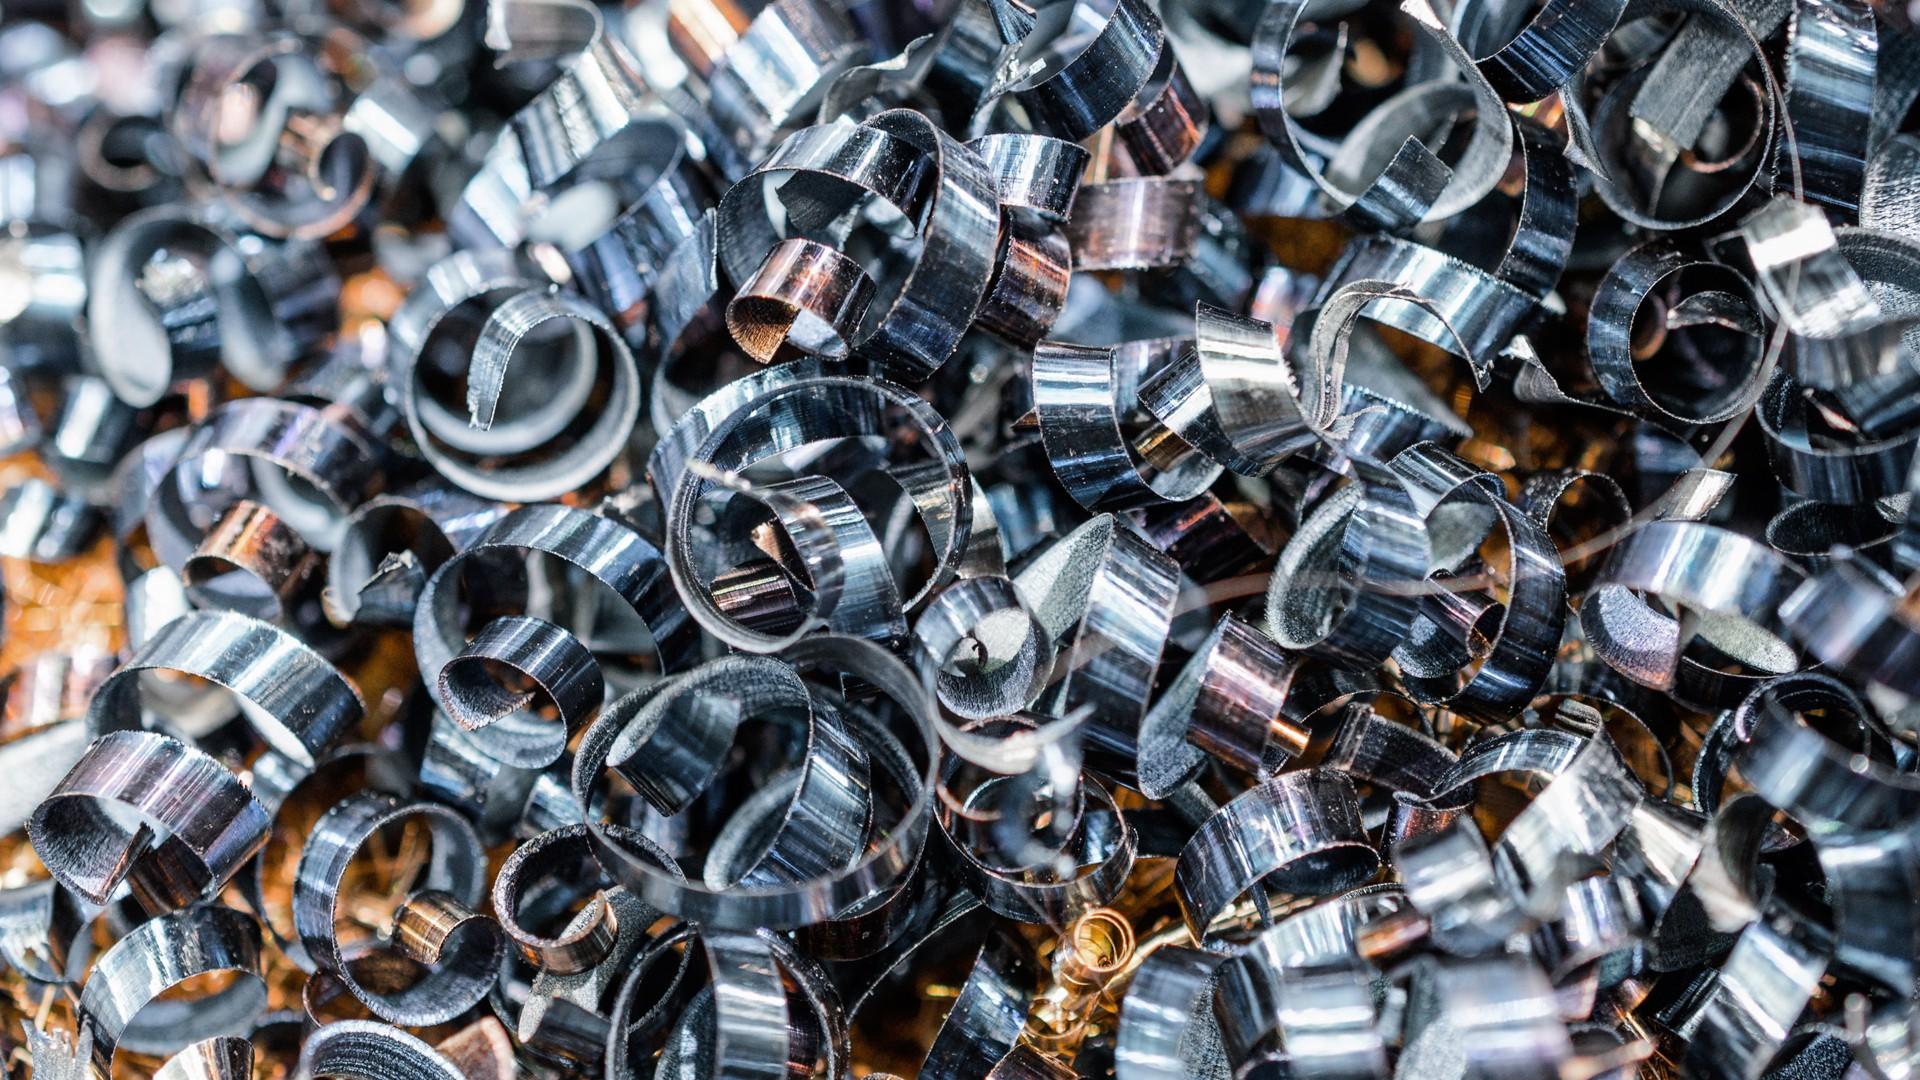 000 Chatarra reciclado de metal chatarreria reciclaje (1)